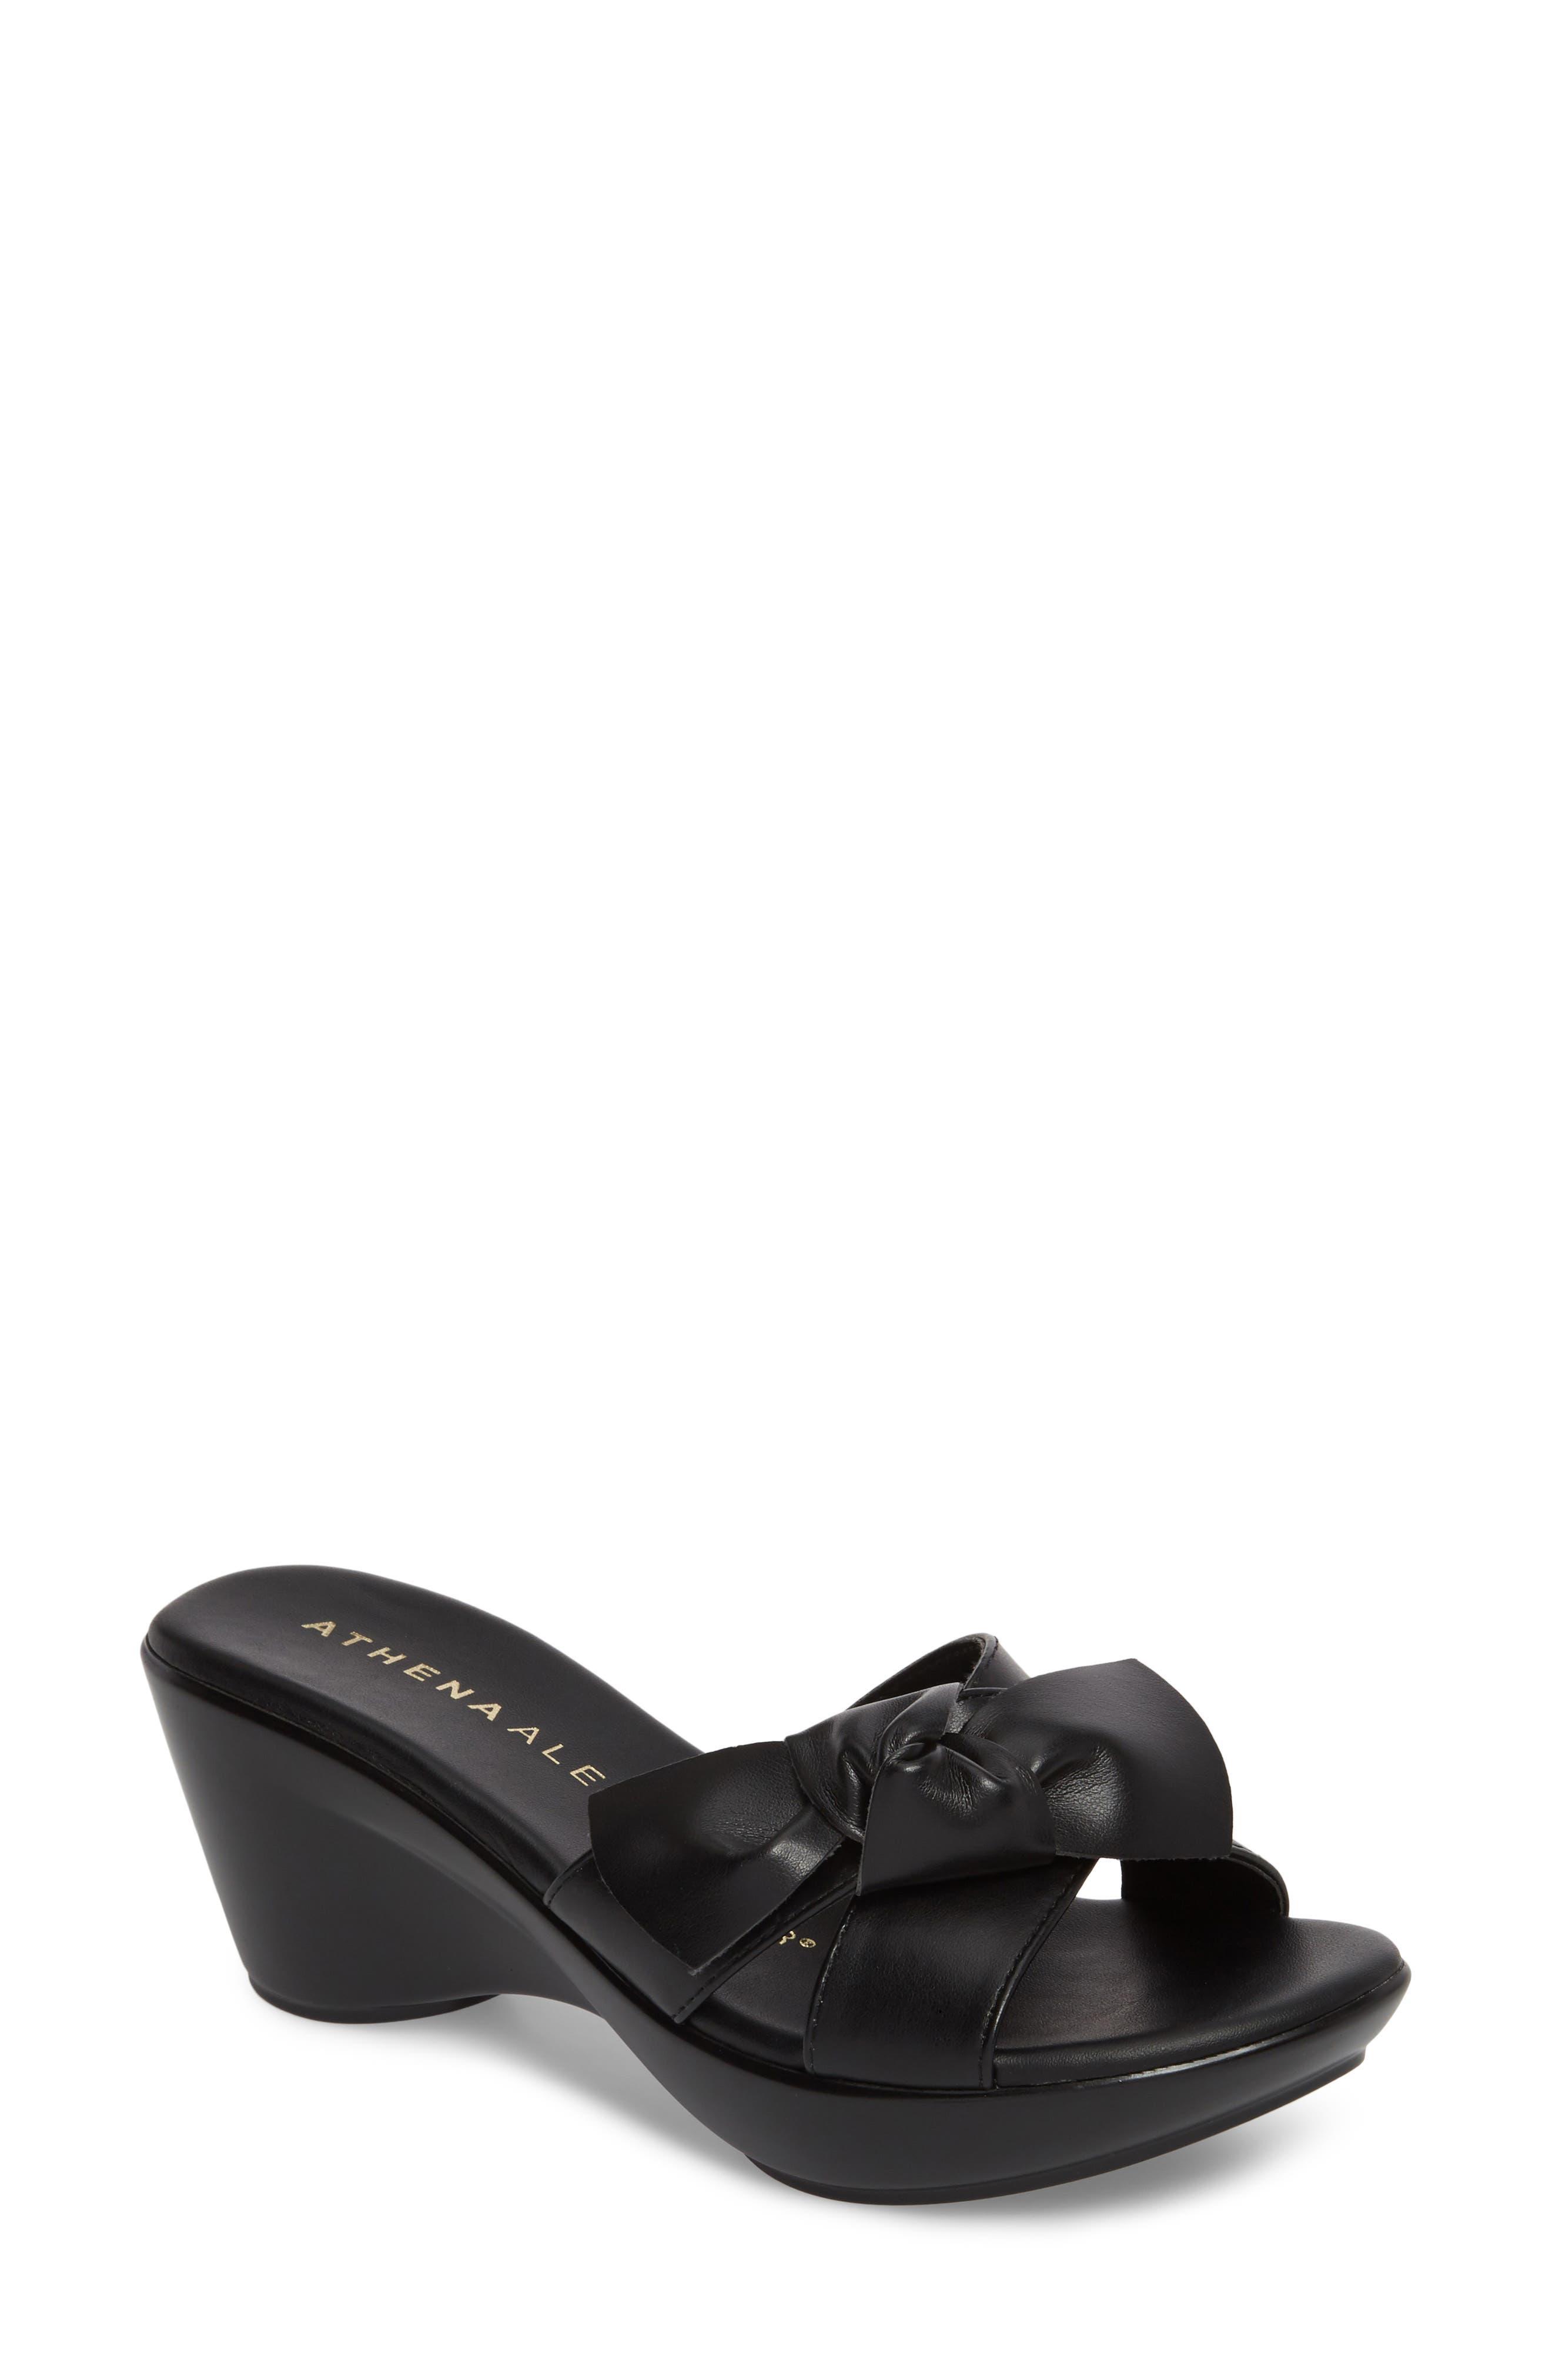 Giada Wedge Sandal,                         Main,                         color, 001